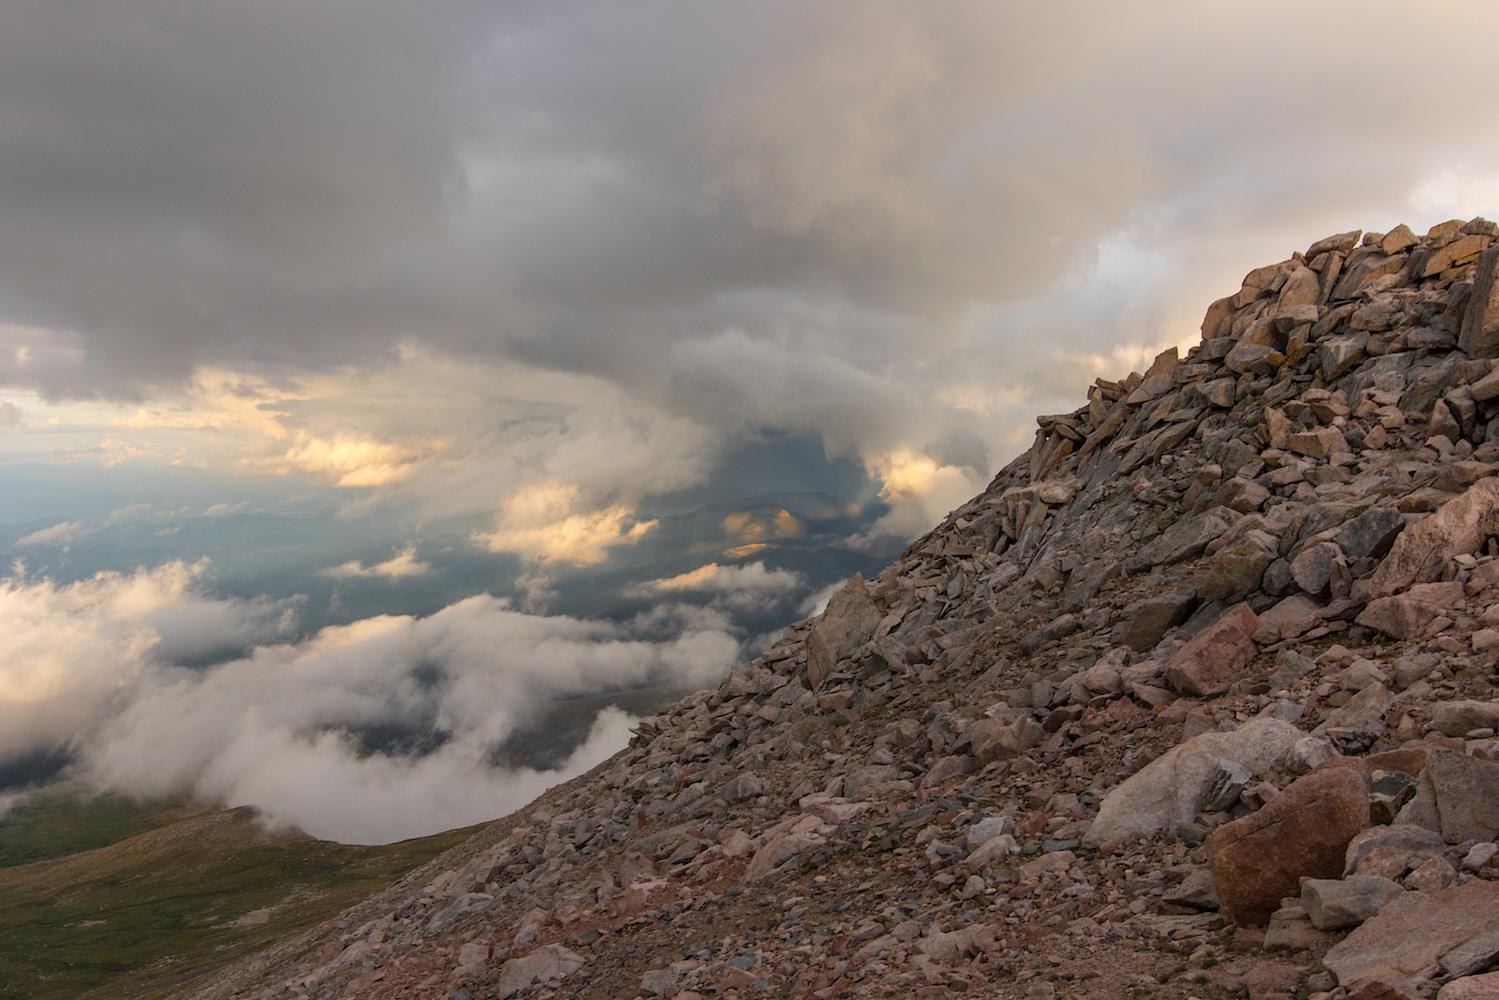 Mt Evans, Image # 6280